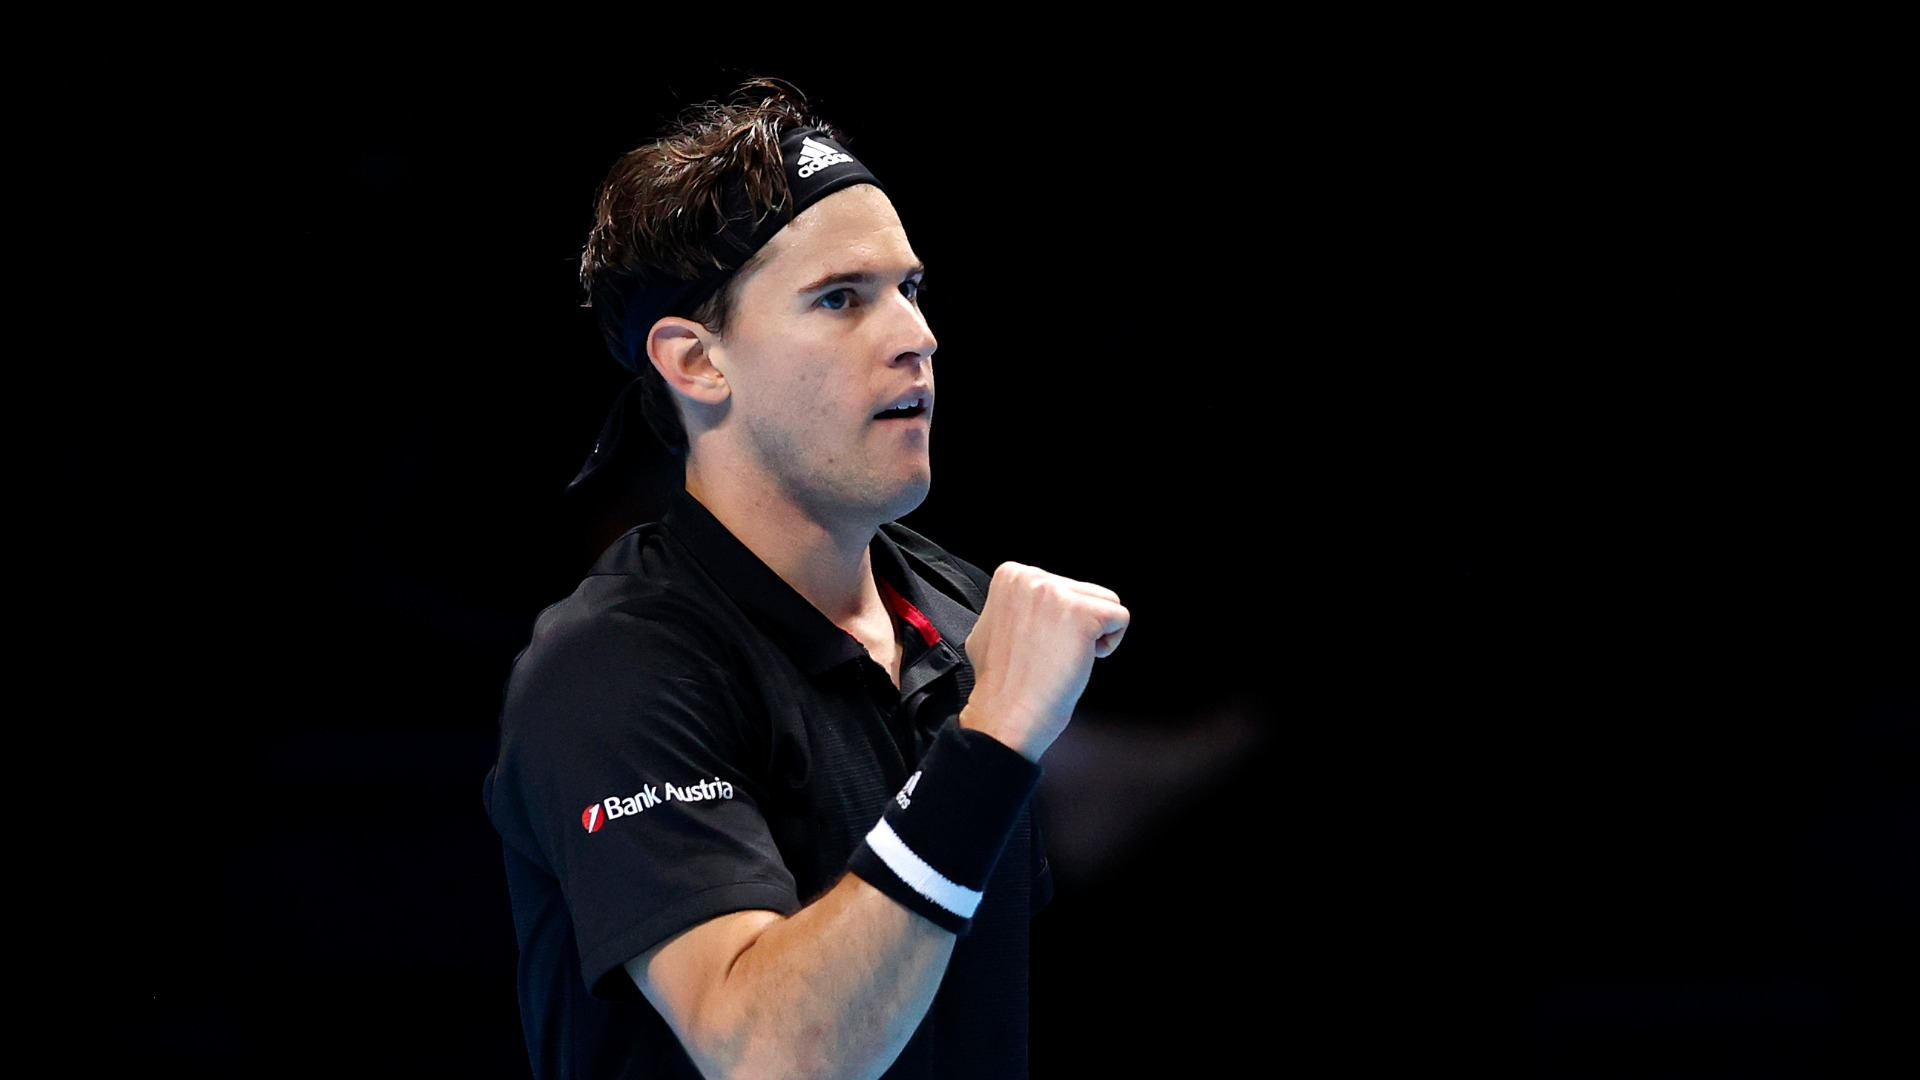 ATP Finals: 2019 finalist Thiem outlasts Djokovic in tense semi